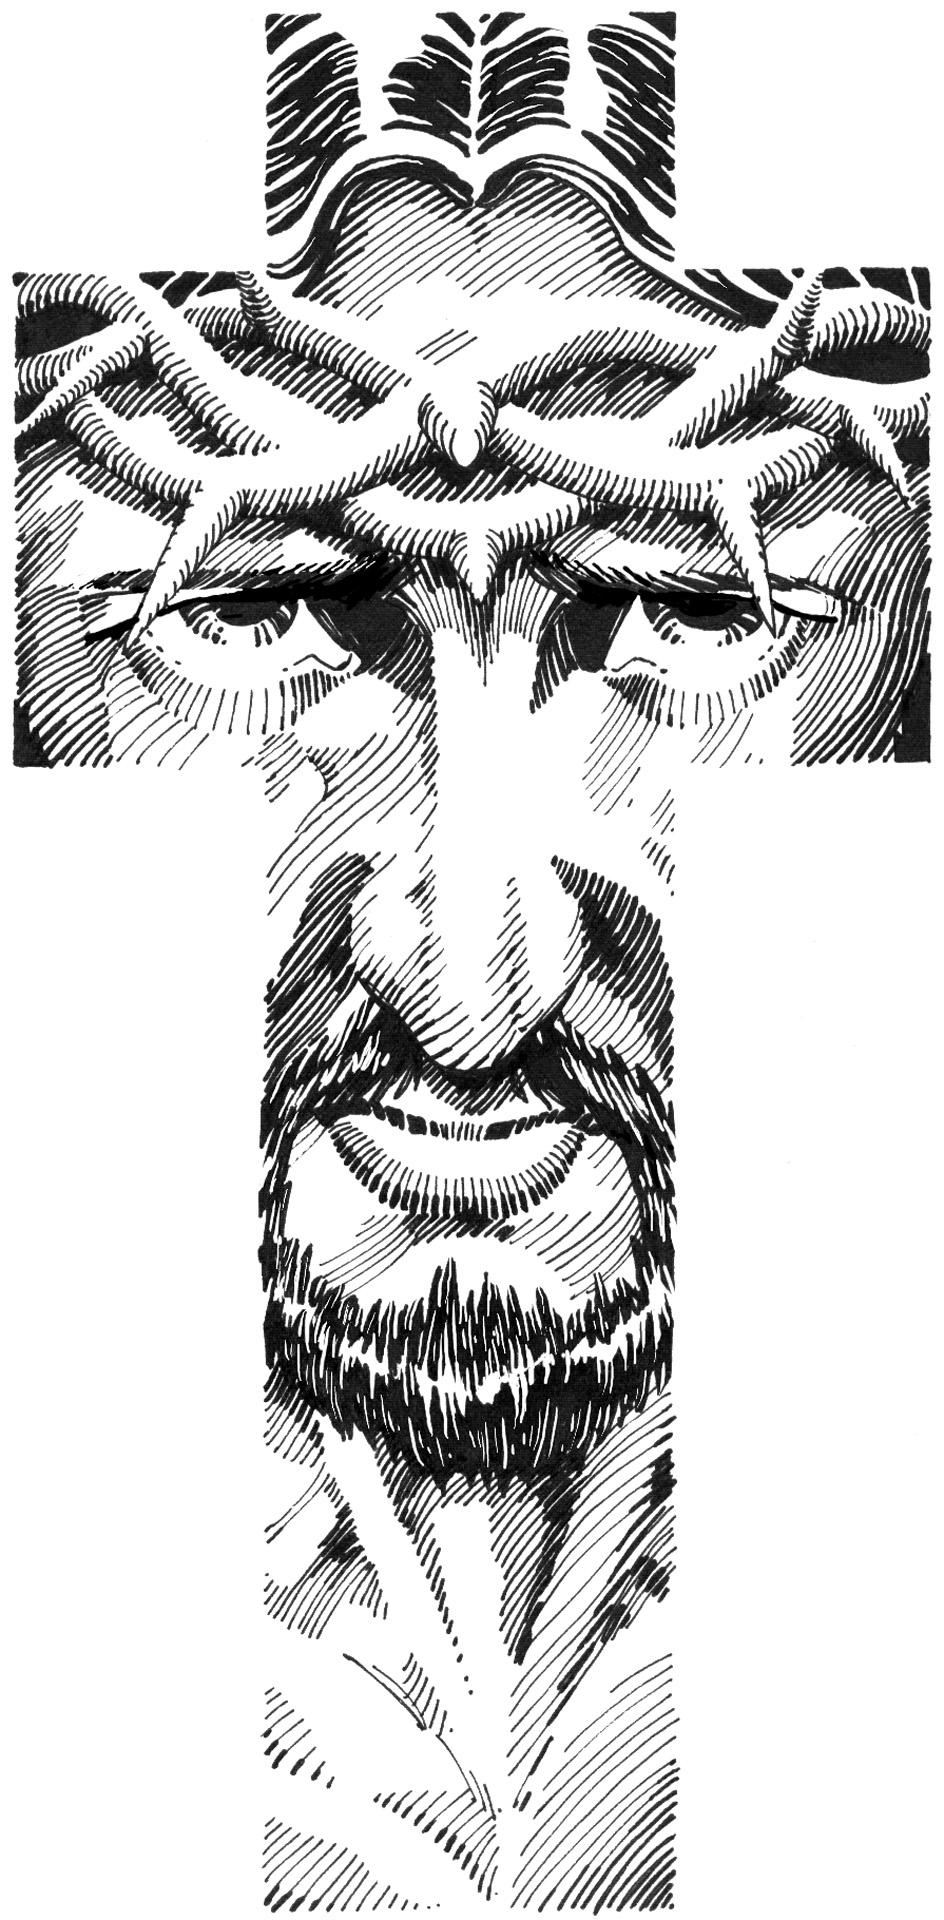 scottmcdaniel.net - Christian Art